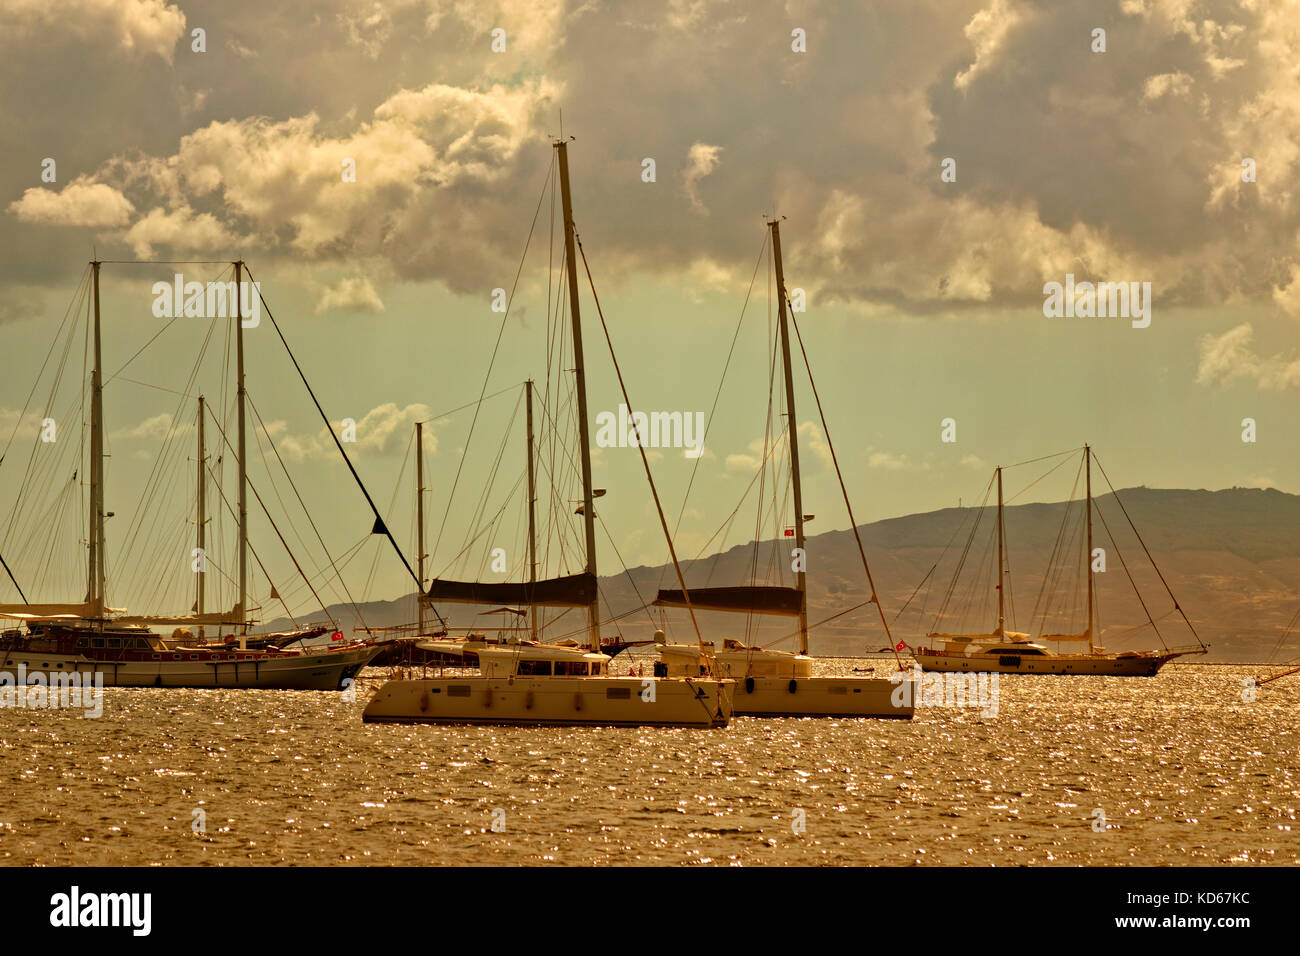 Yachts, catamarans at anchor at Bodrum, Mugla Province, Turkey. - Stock Image